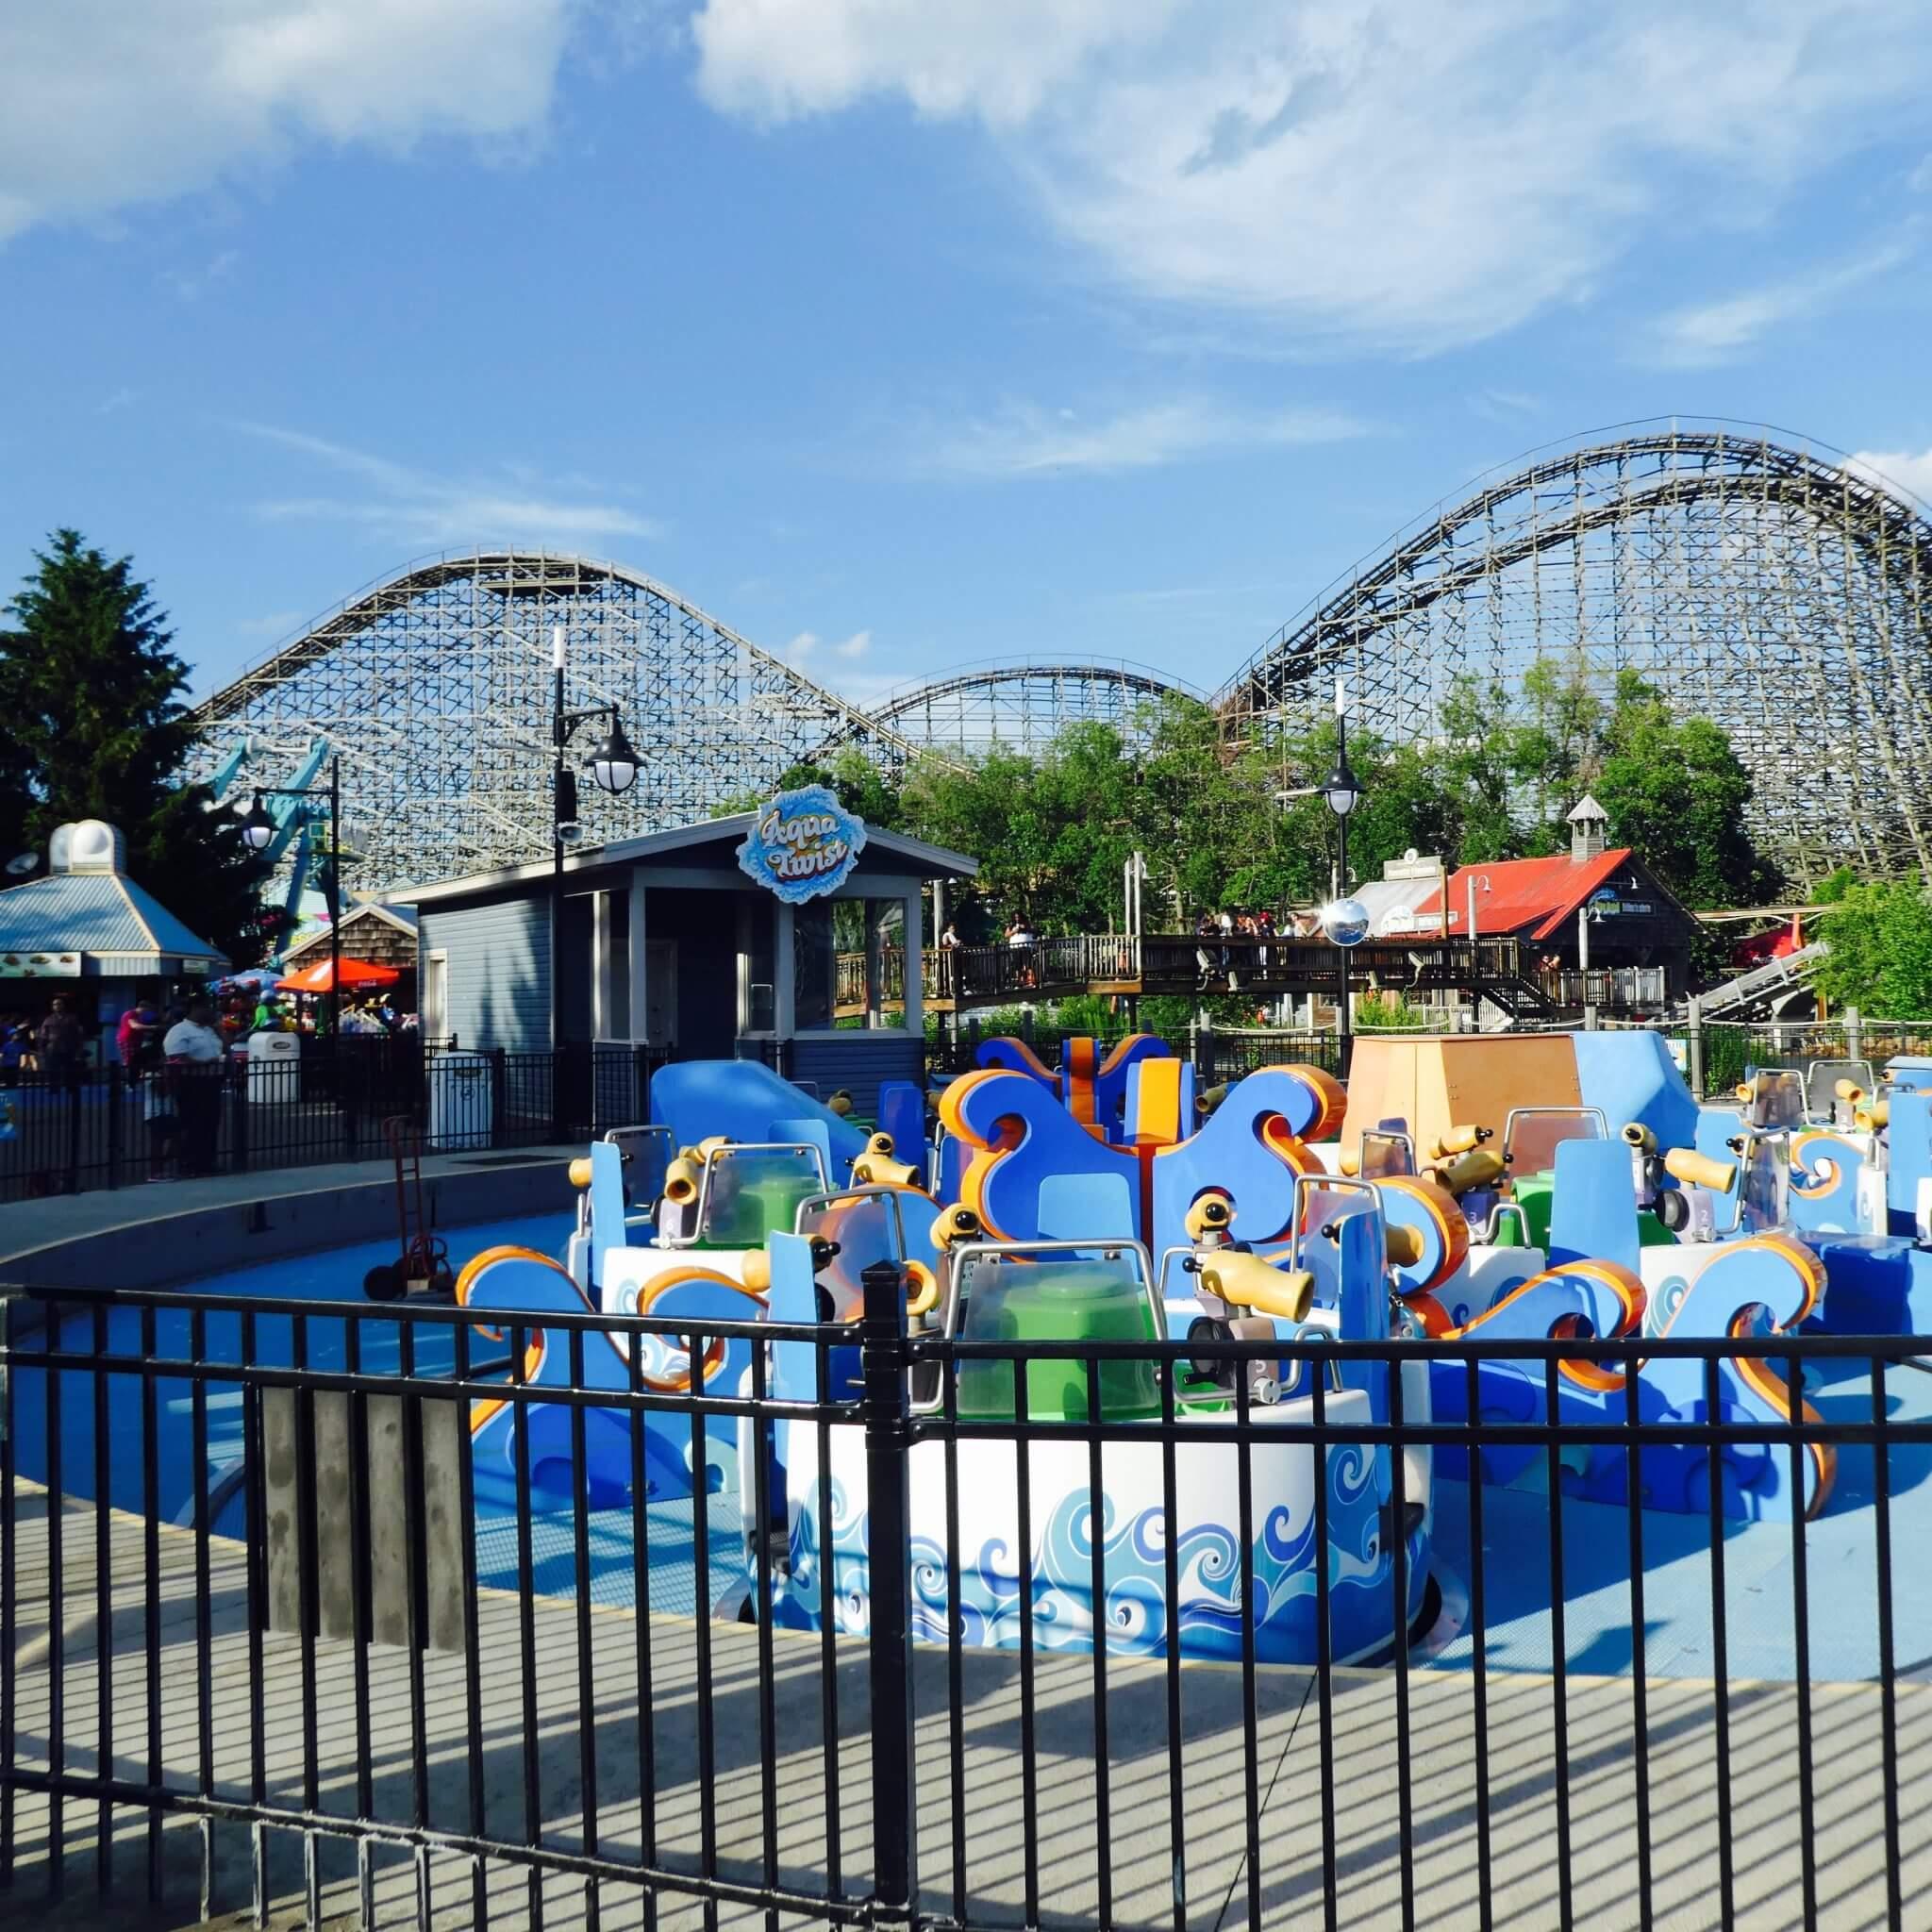 la ronde parc d'attraction montreal